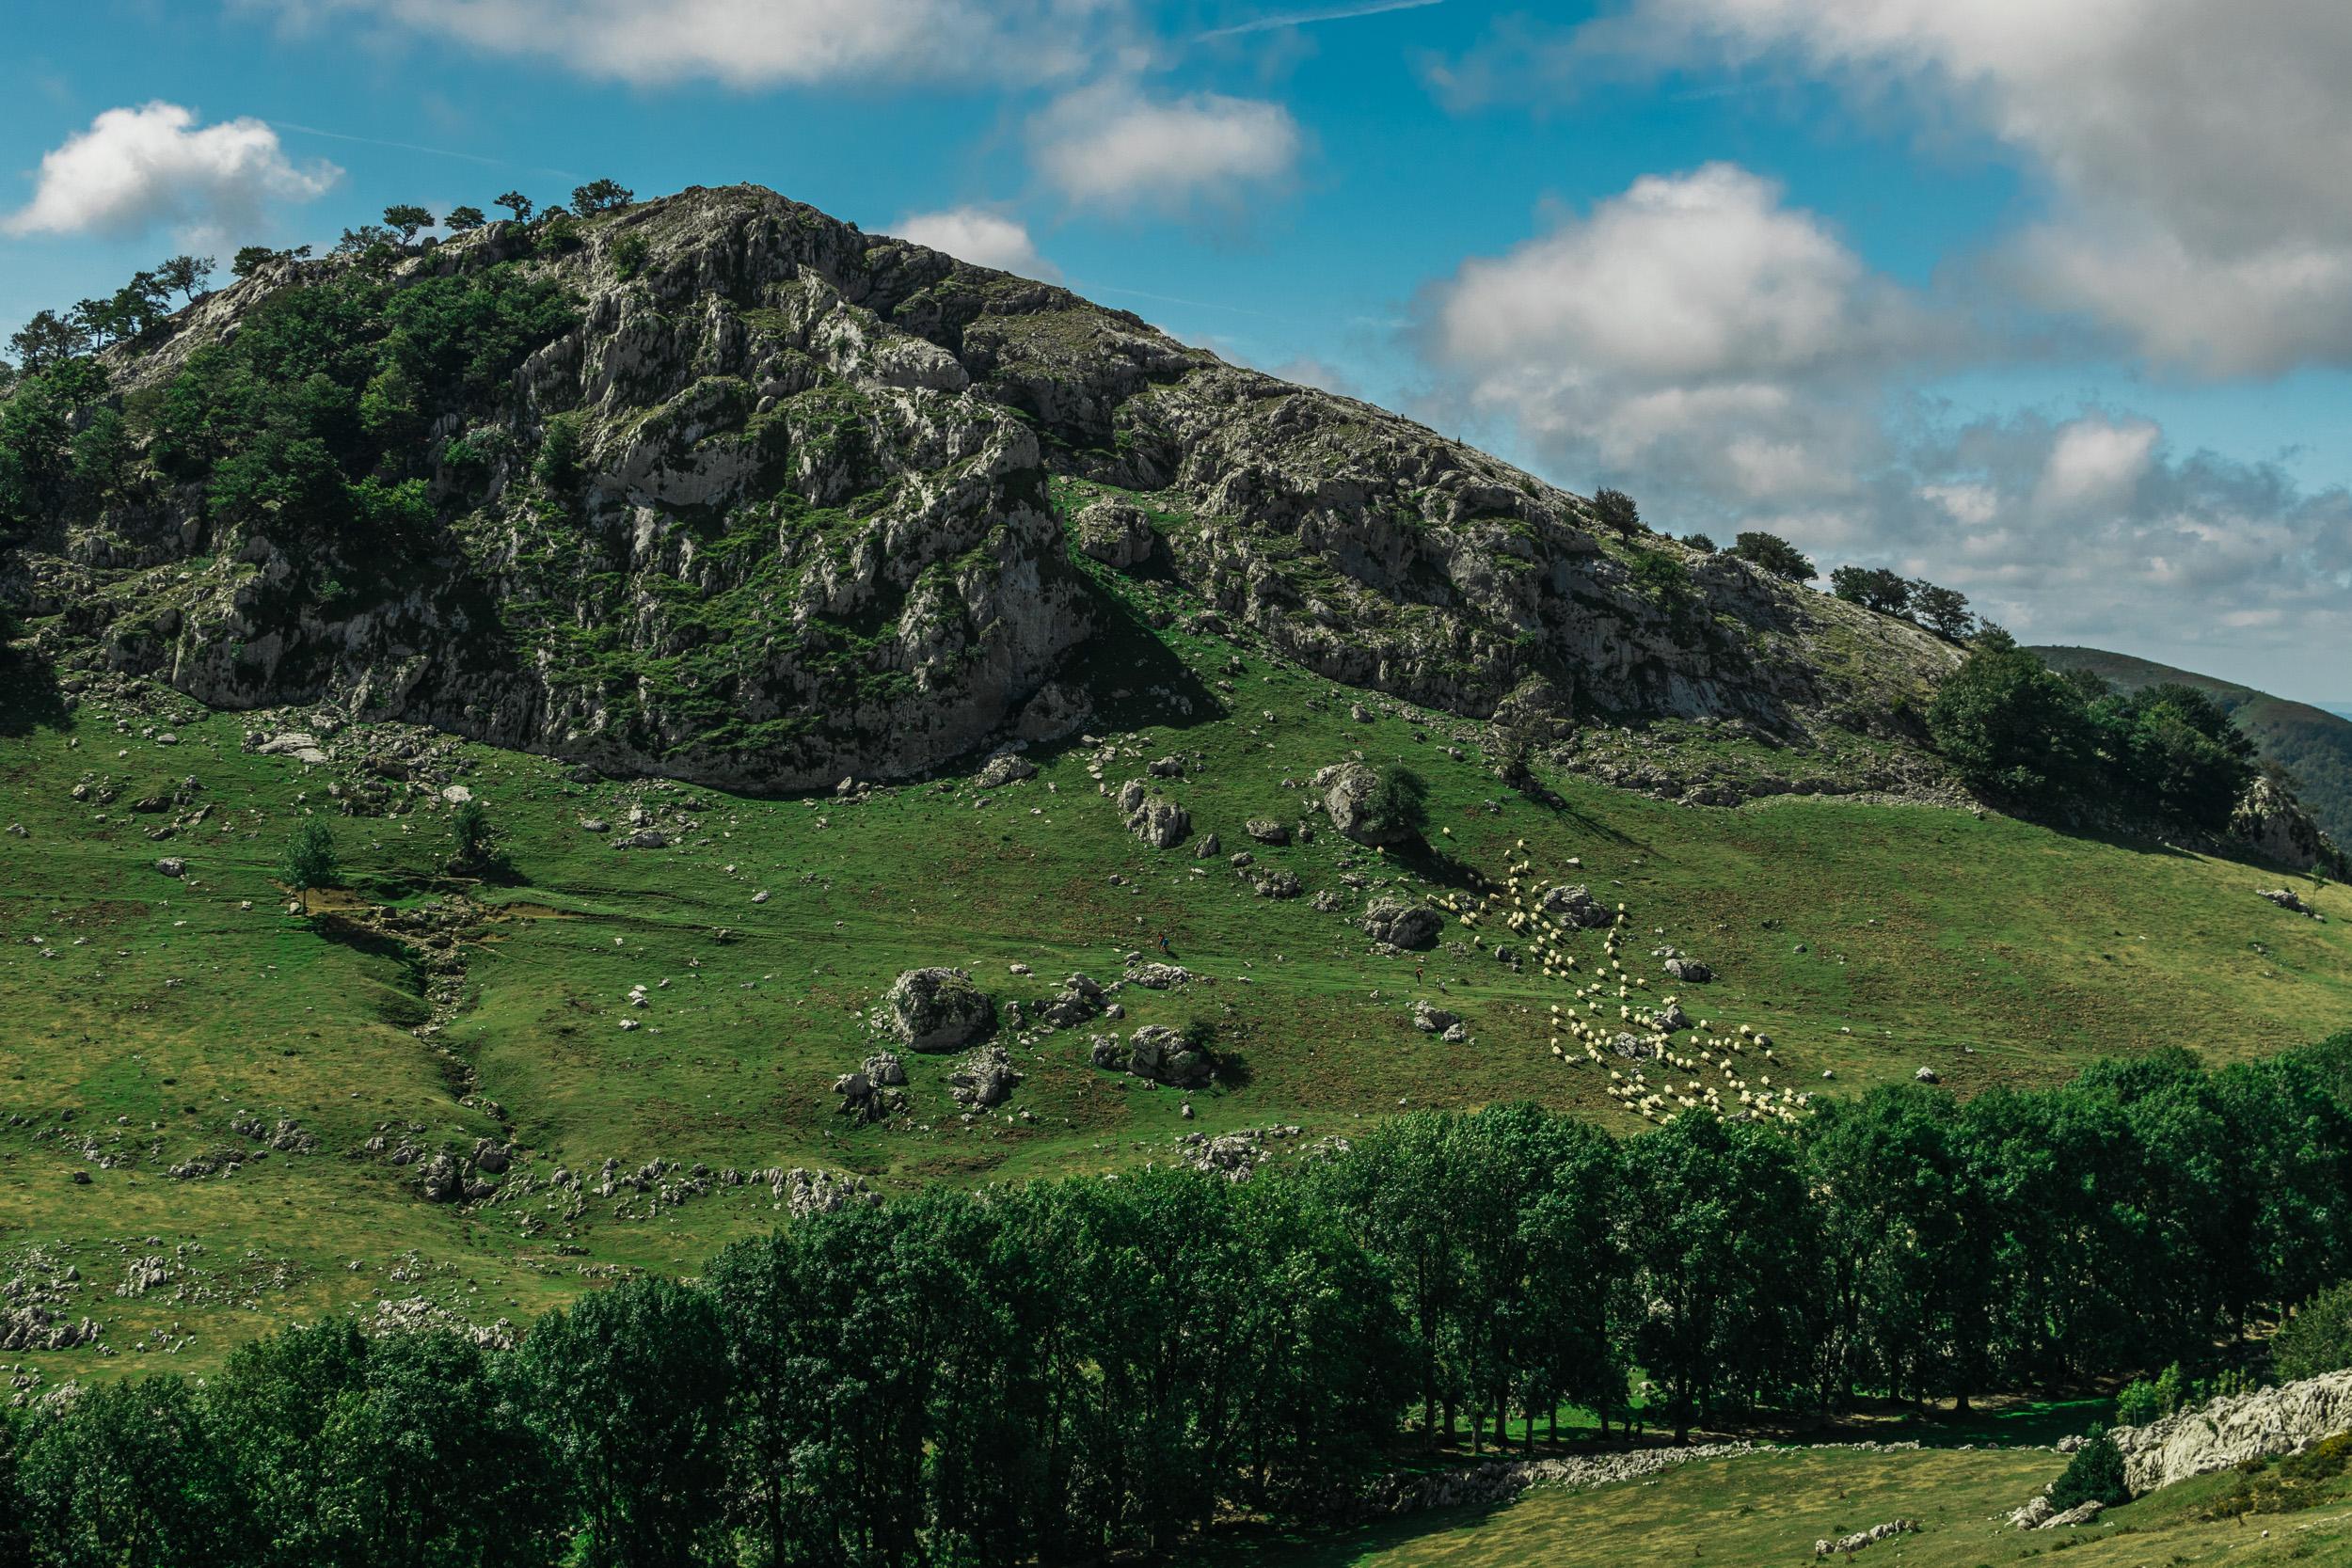 Sheep in mountaintop